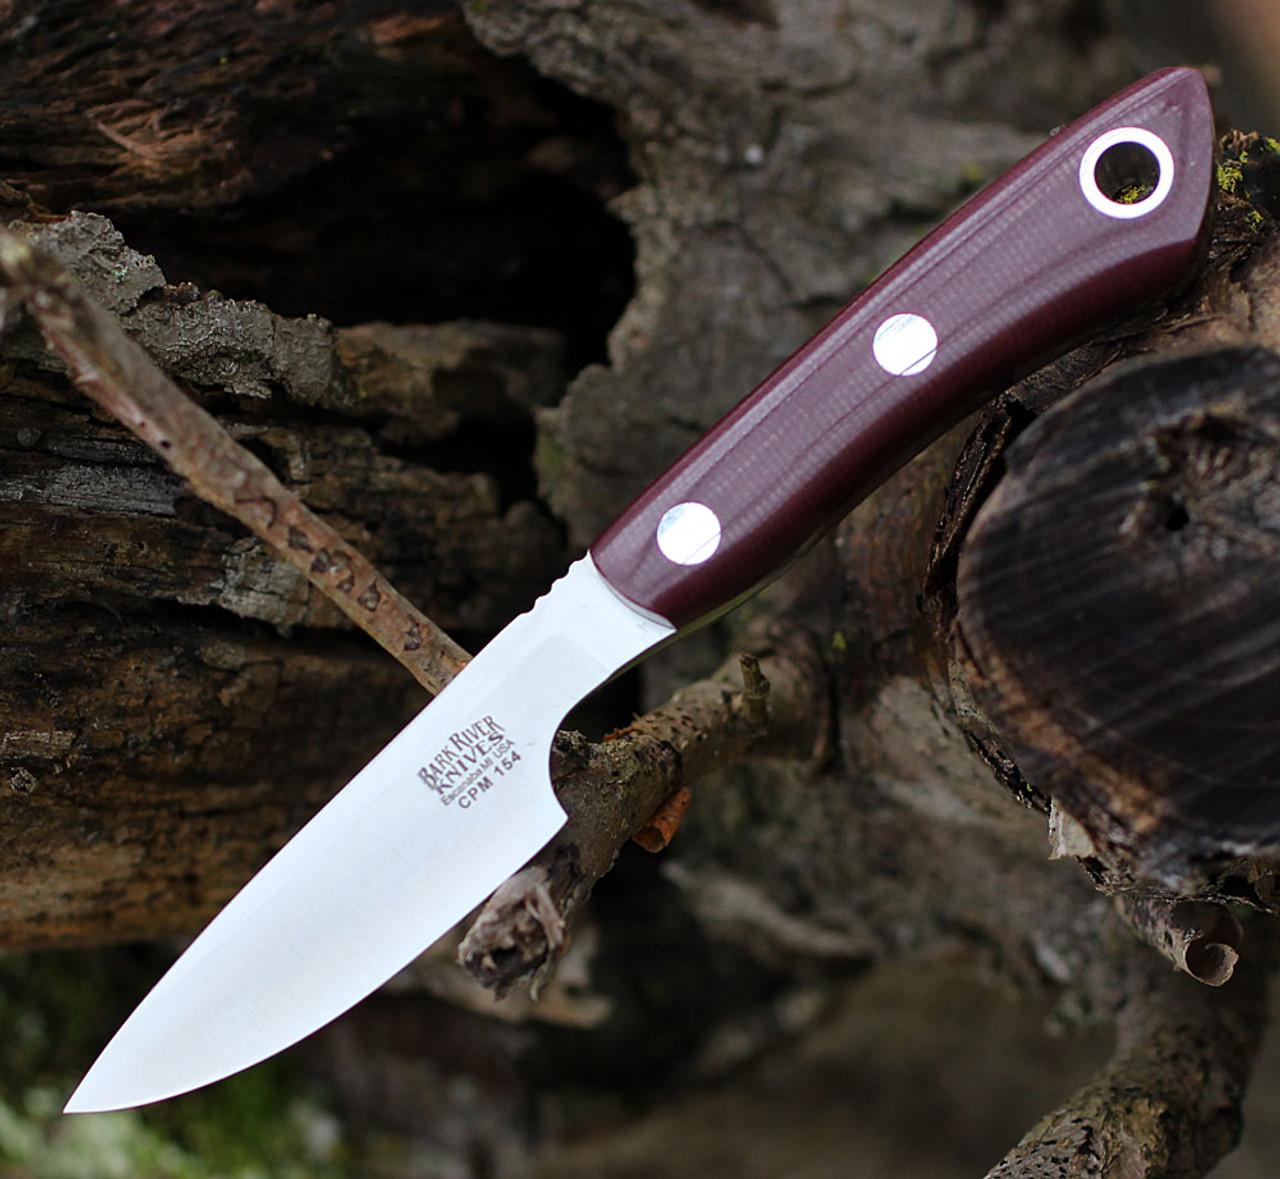 "Bark River Knives Rascal II-BA14152MBU, 3.0"" CPM 154, Burgundy Canvas Micarta Handle"